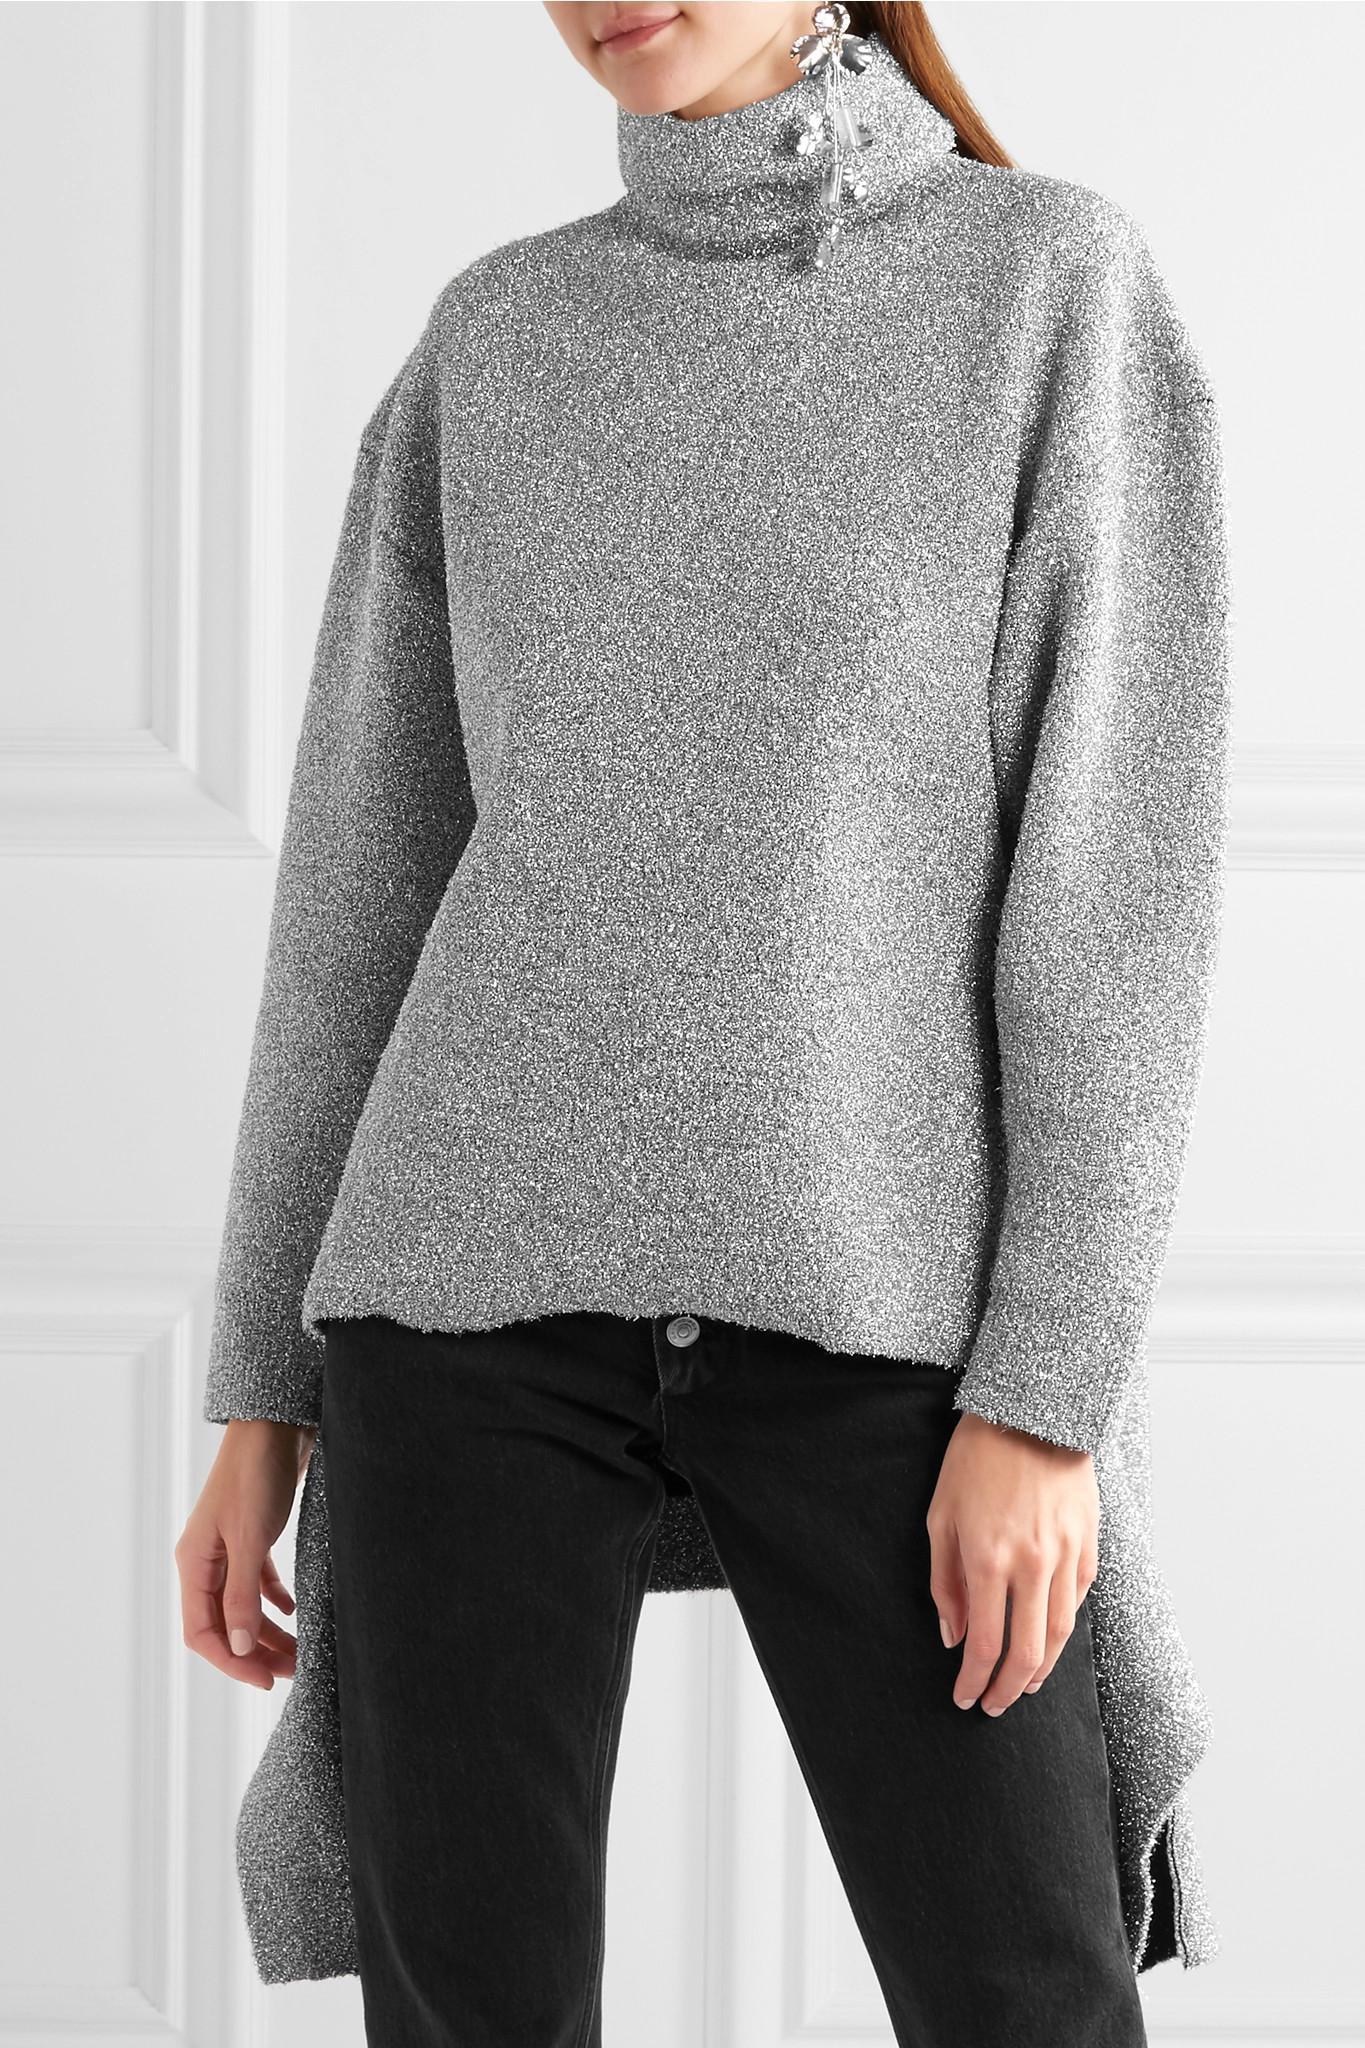 78fa1e609d Balenciaga Oversized Metallic Knitted Turtleneck Sweater in Gray - Lyst